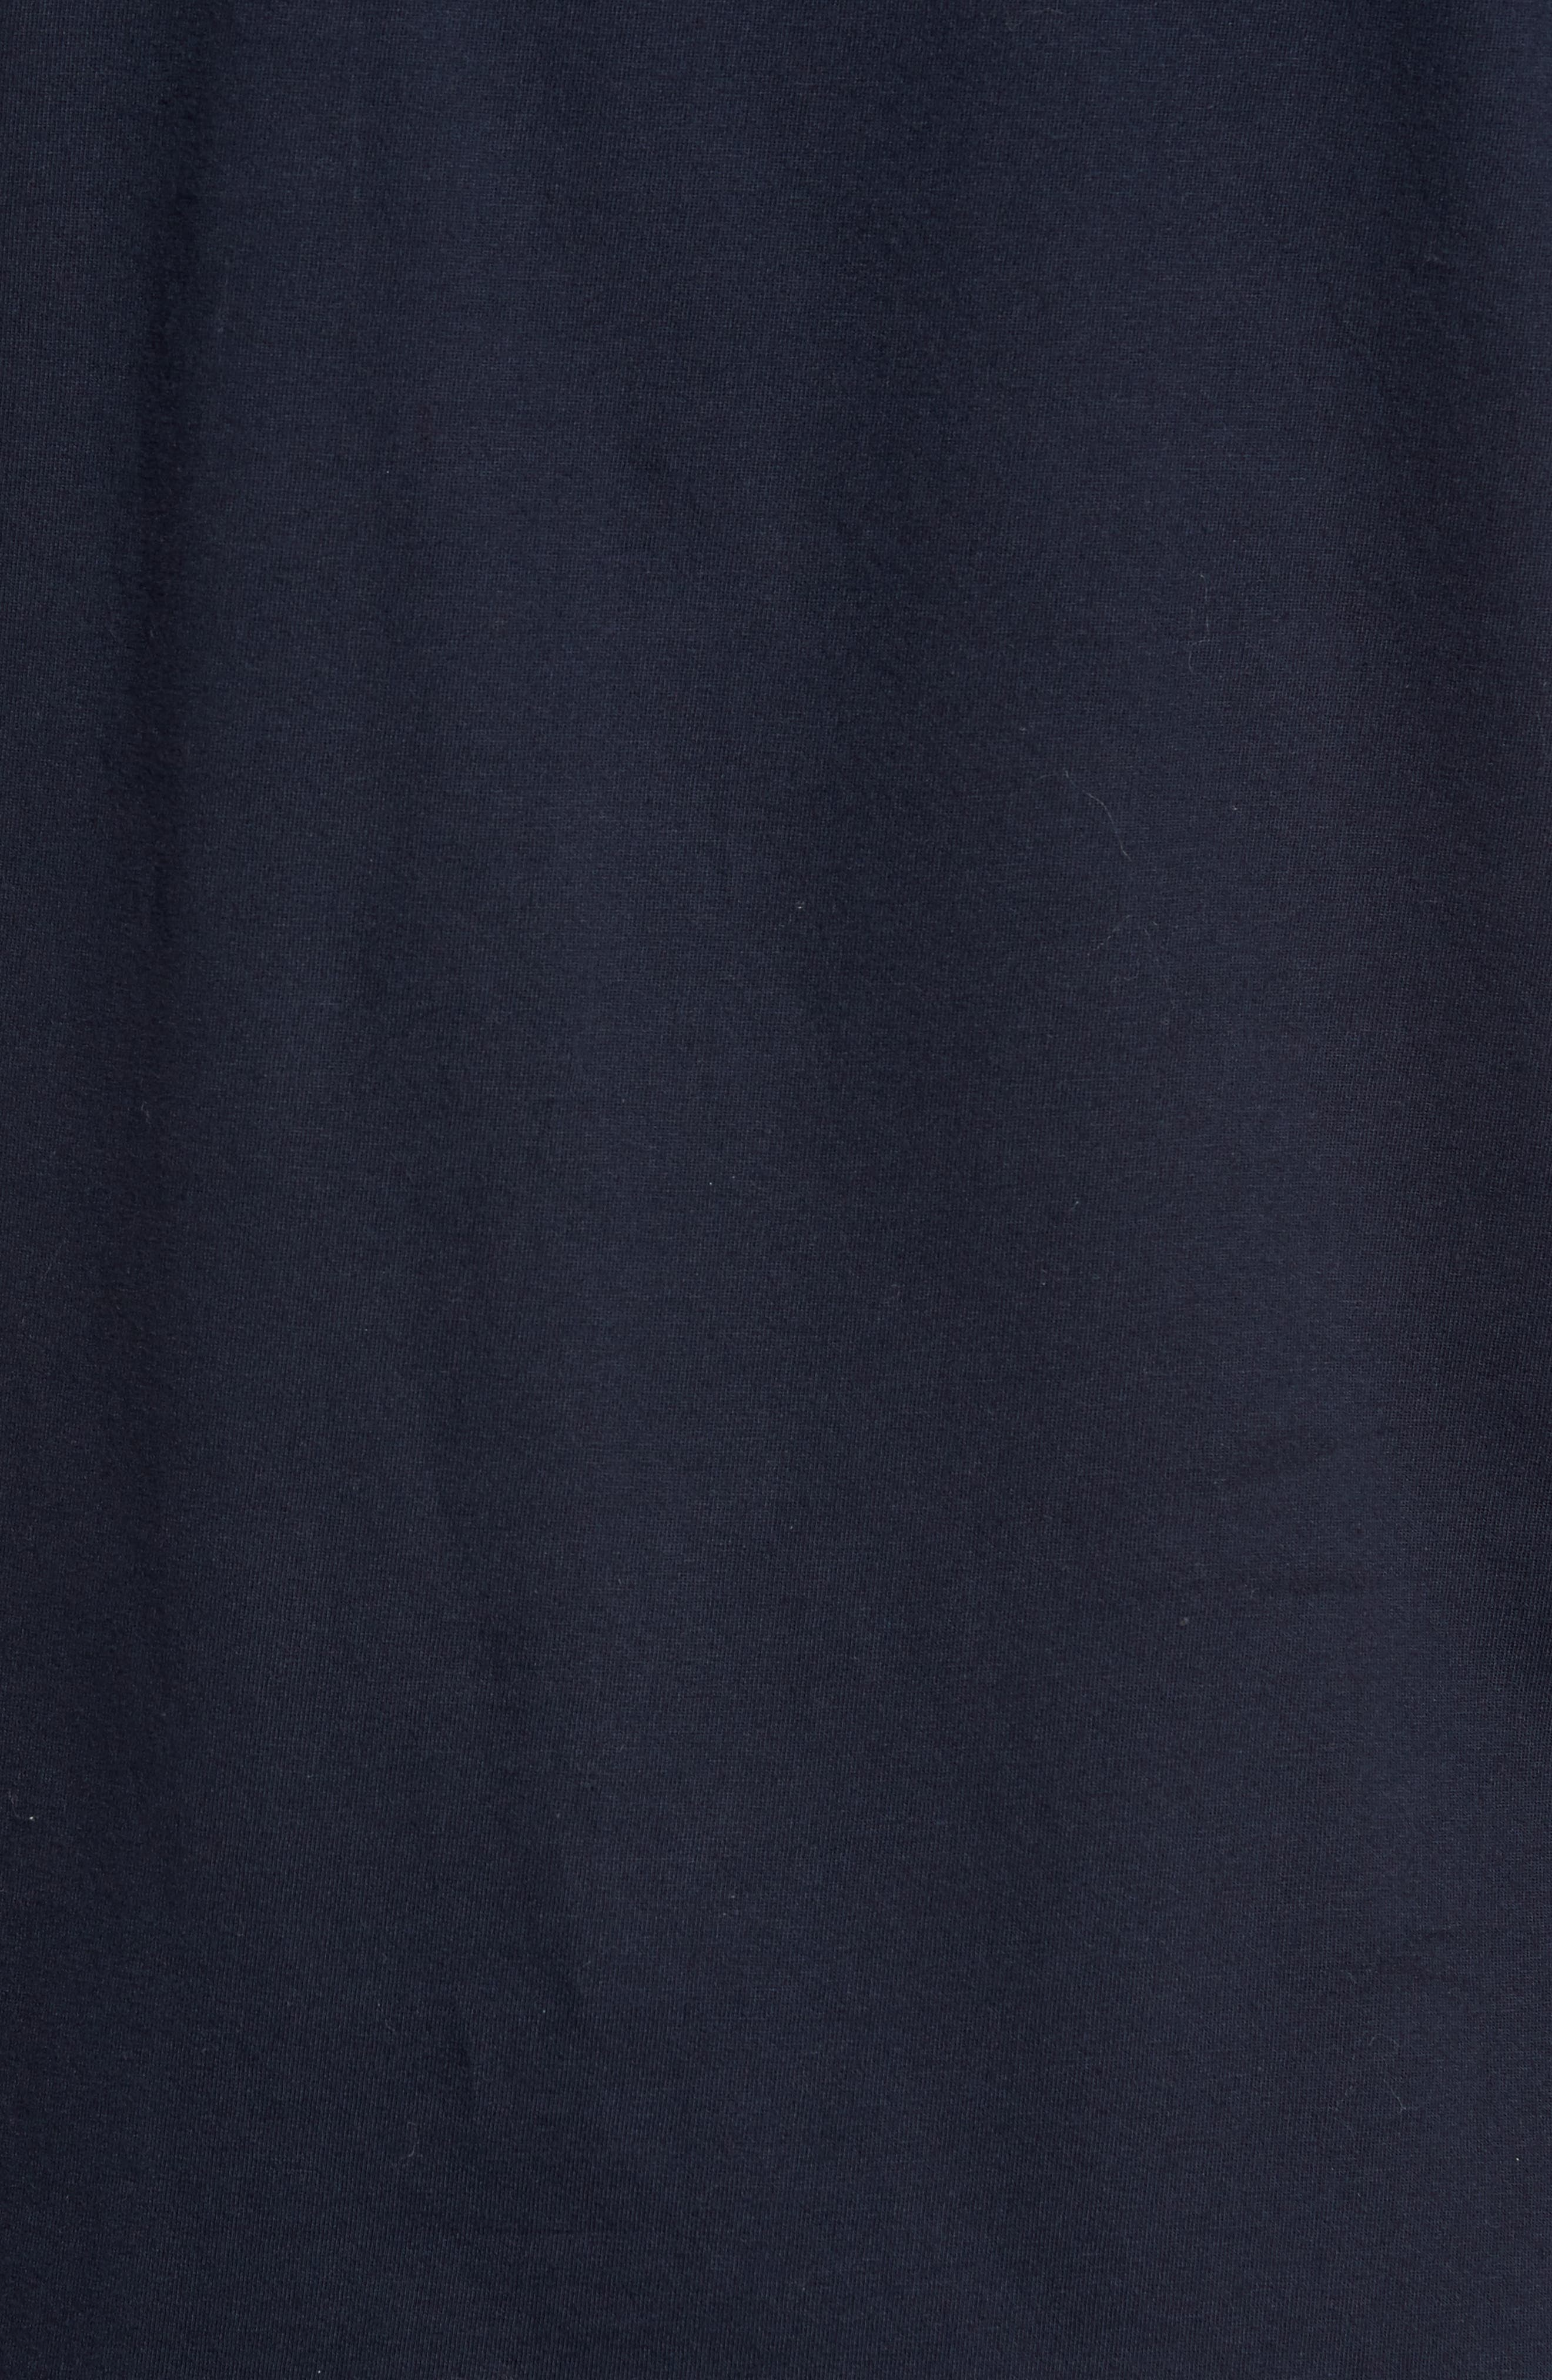 Comme Ci Comme Ça Regular Fit T-Shirt,                             Alternate thumbnail 6, color,                             Marine Blue/ White